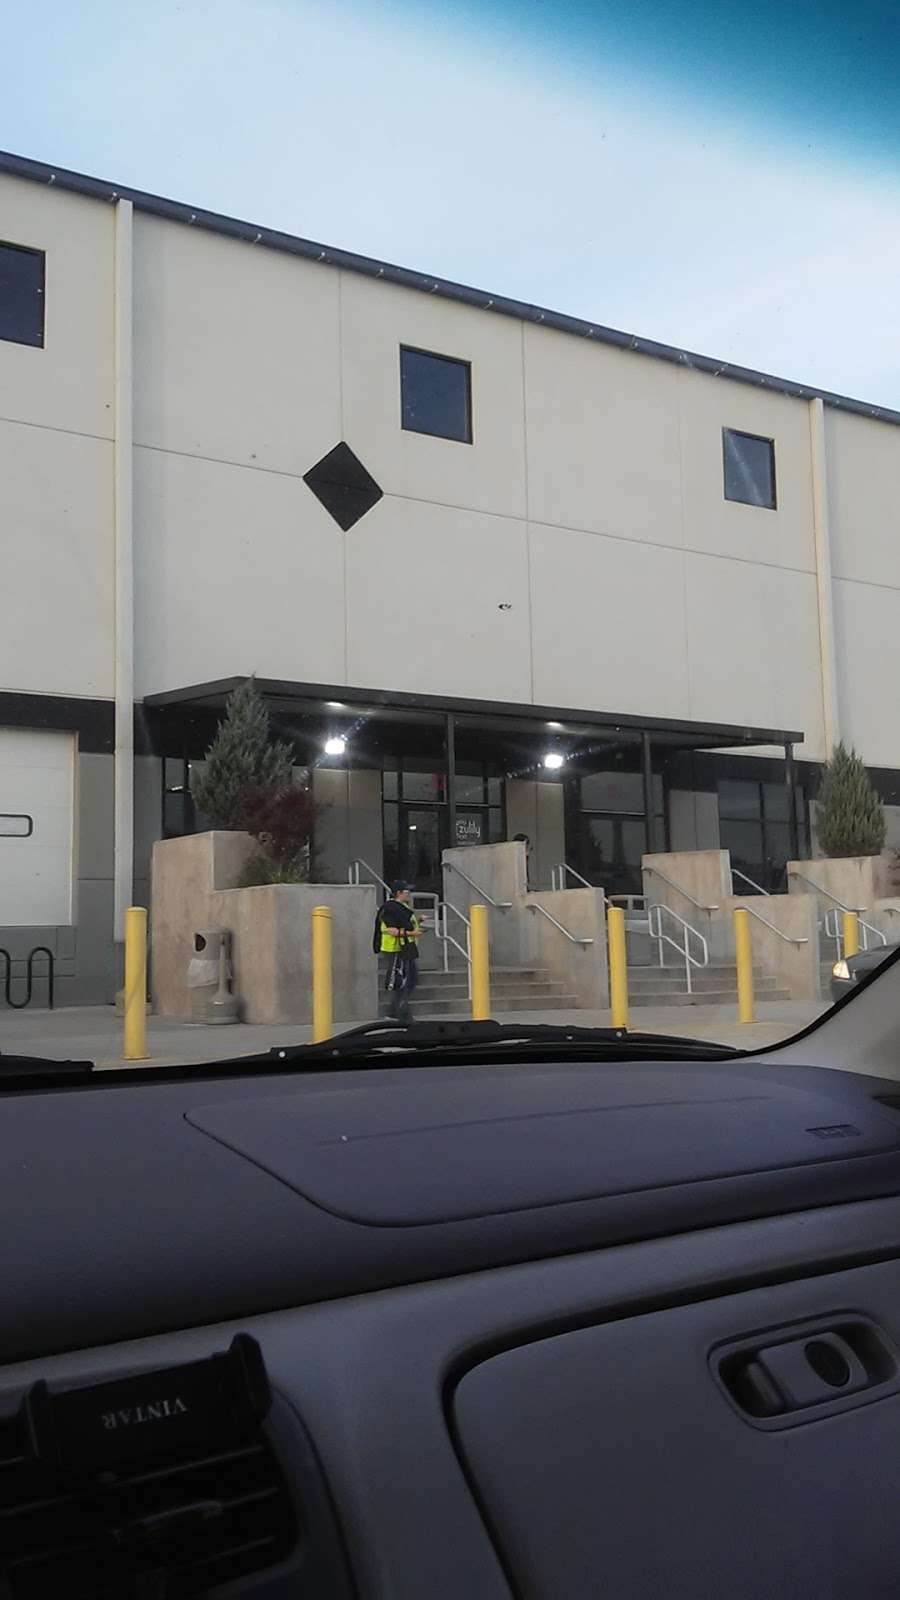 Zulily Bethlehem - storage  | Photo 7 of 8 | Address: 10 Emery St, Bethlehem, PA 18015, USA | Phone: (484) 747-6144